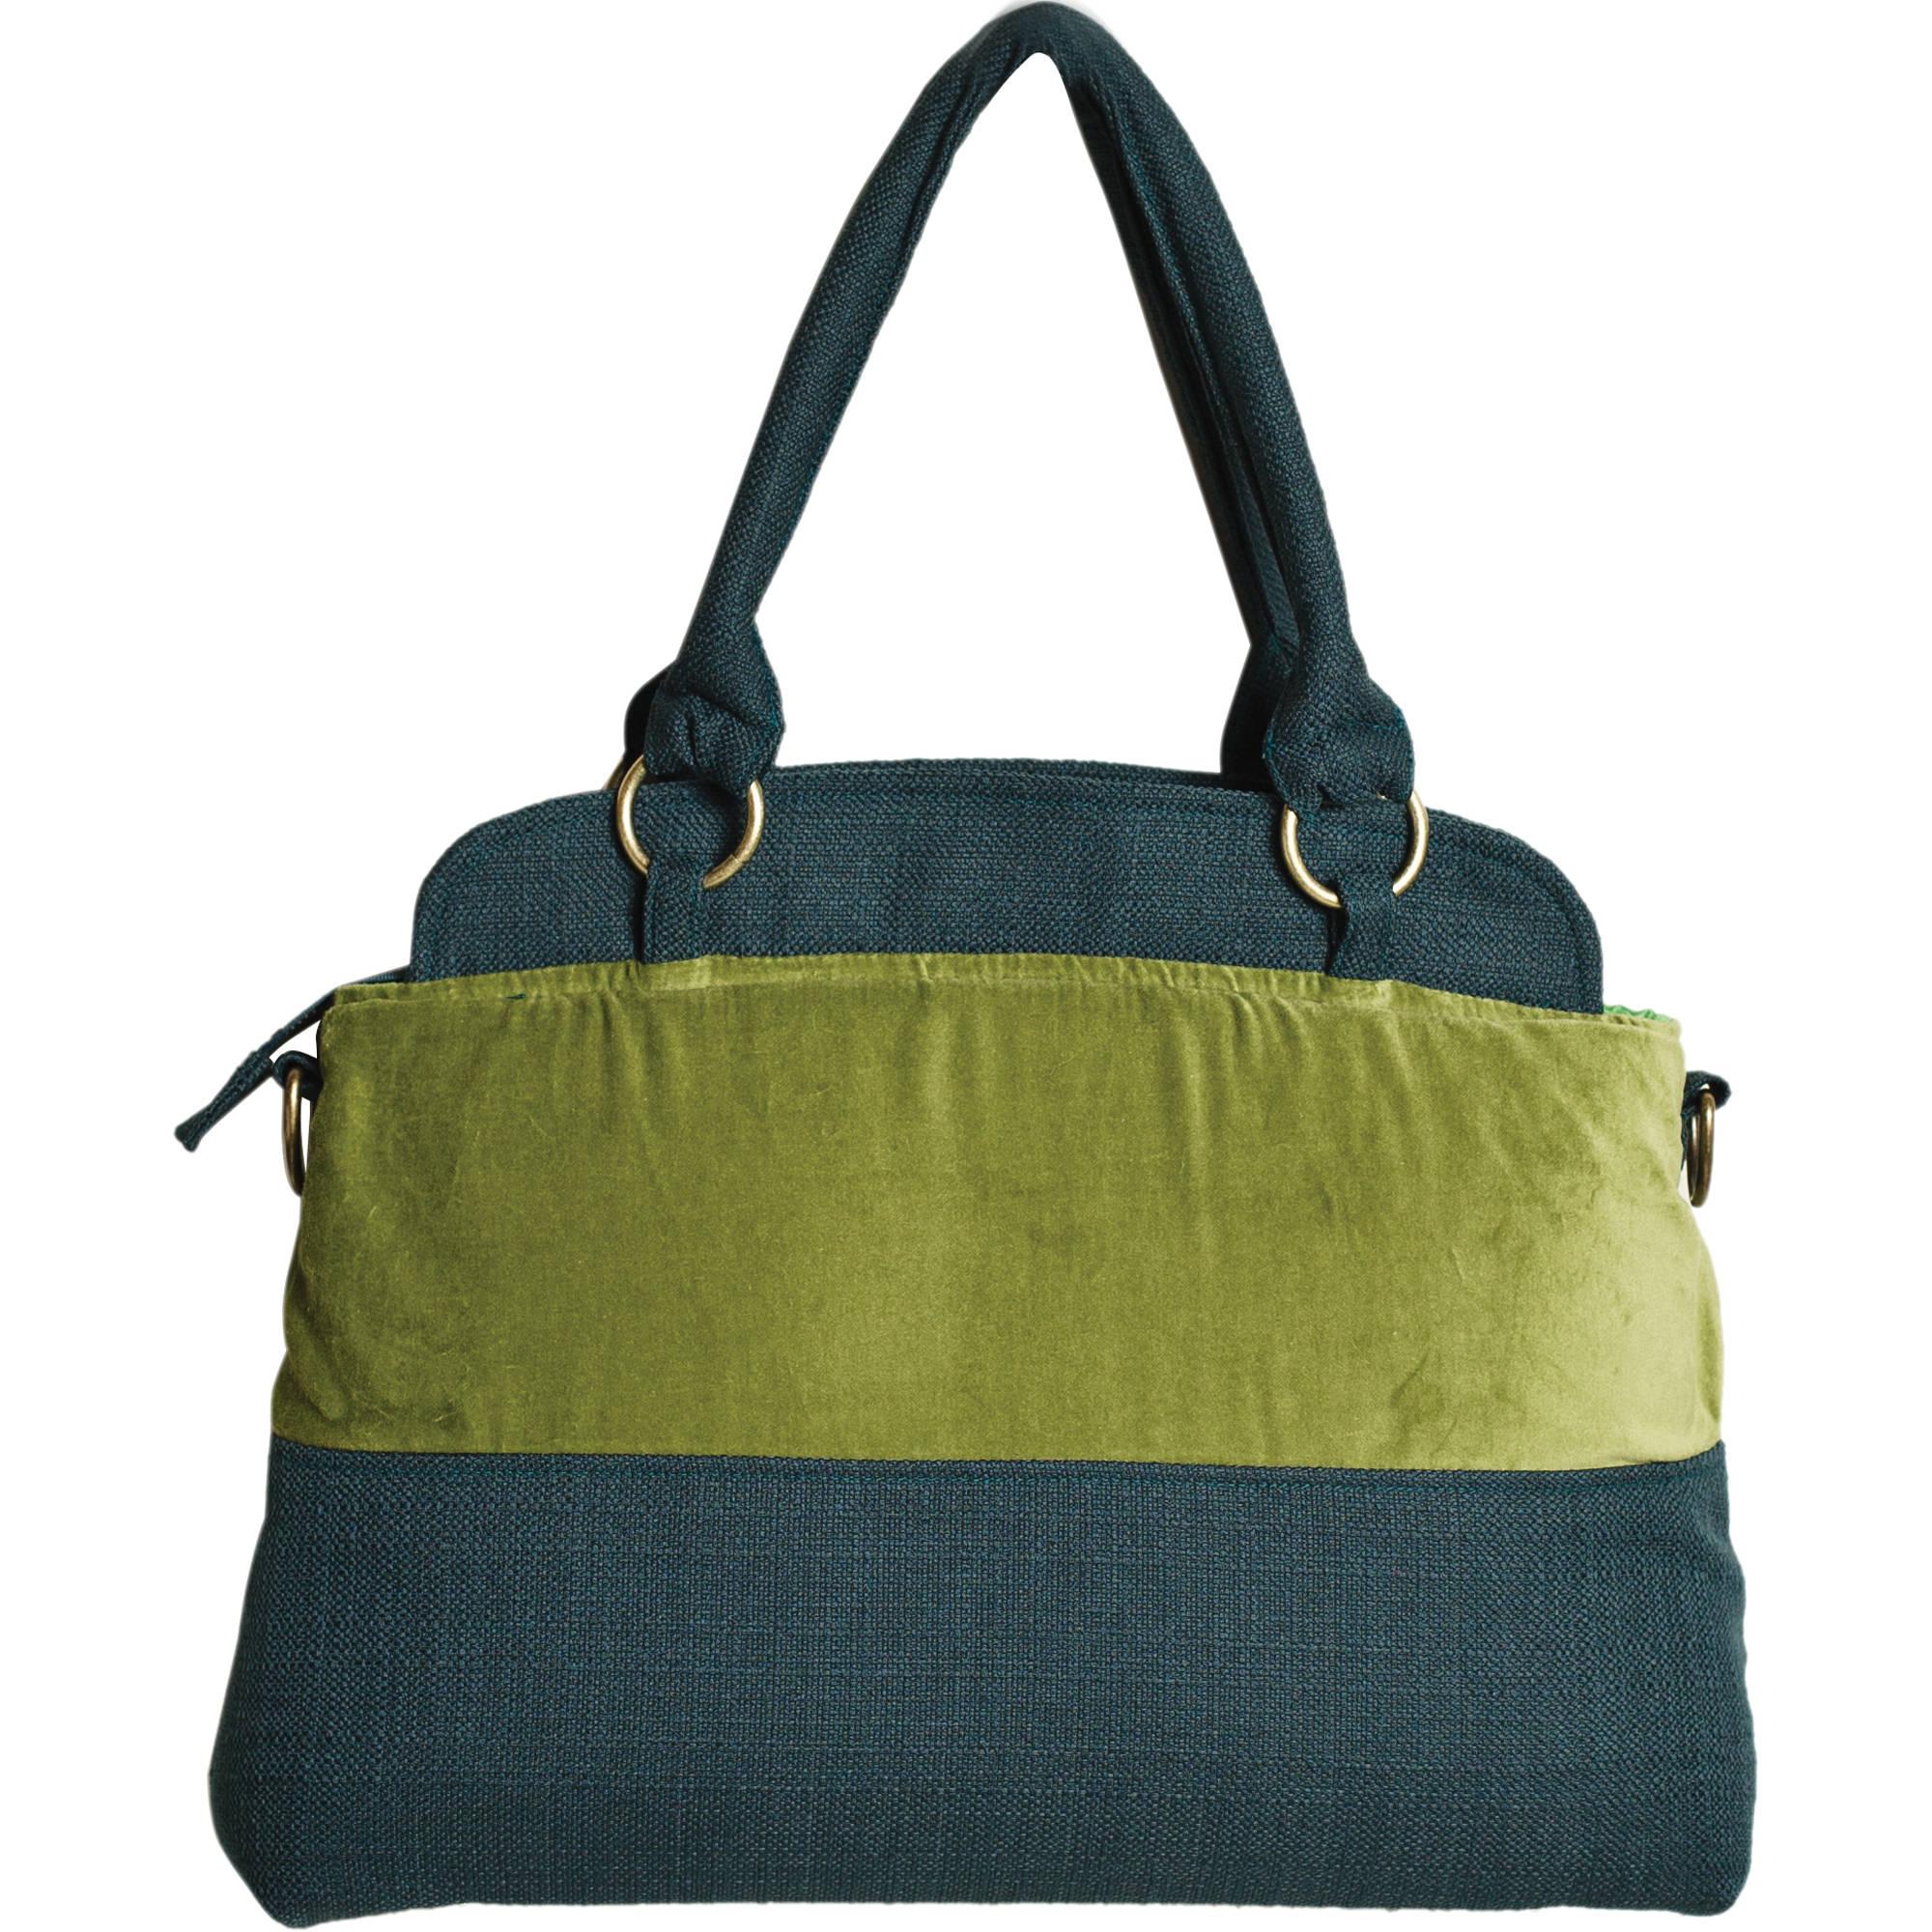 Ketti Handbags Army Navy Camera Bag Olive Green Blue